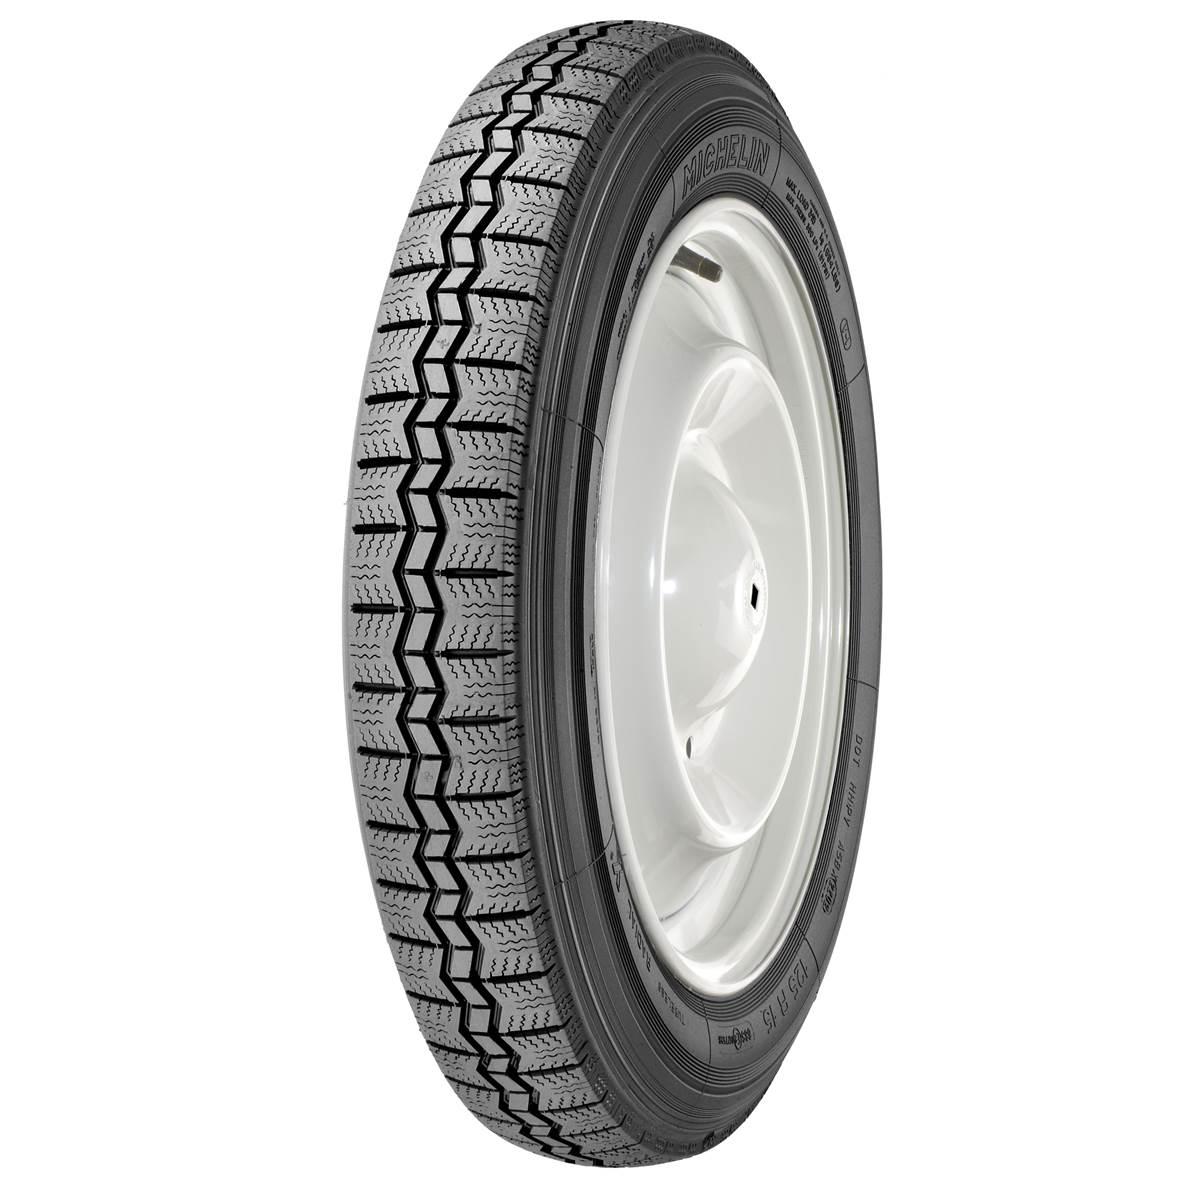 Pneu Michelin Collection 155/80R15 82T X